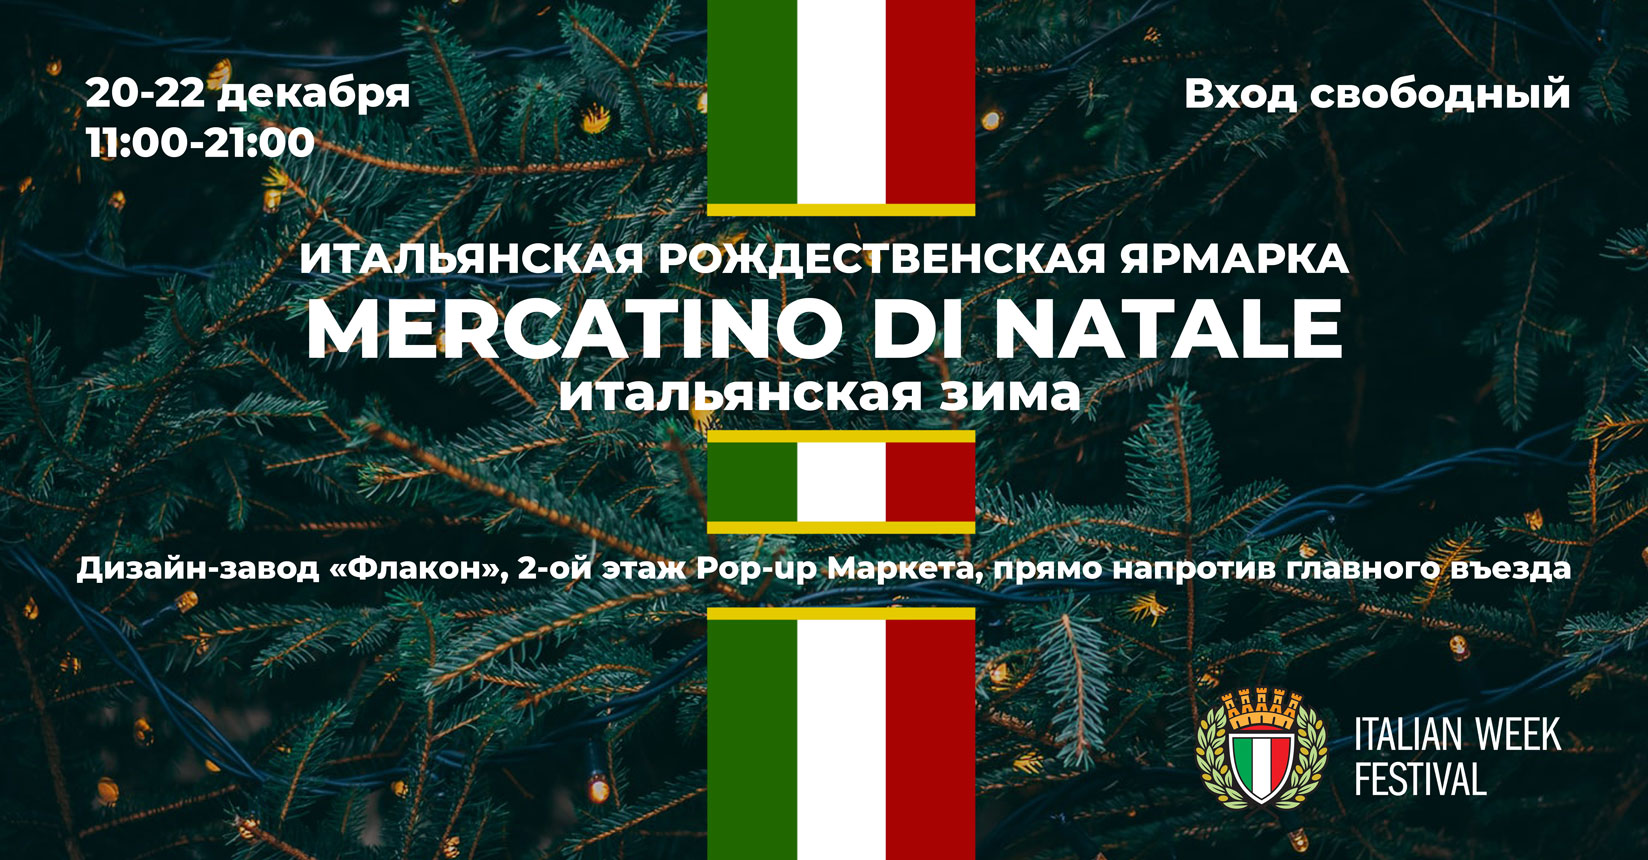 Mercatino di Natale. Итальянская зима